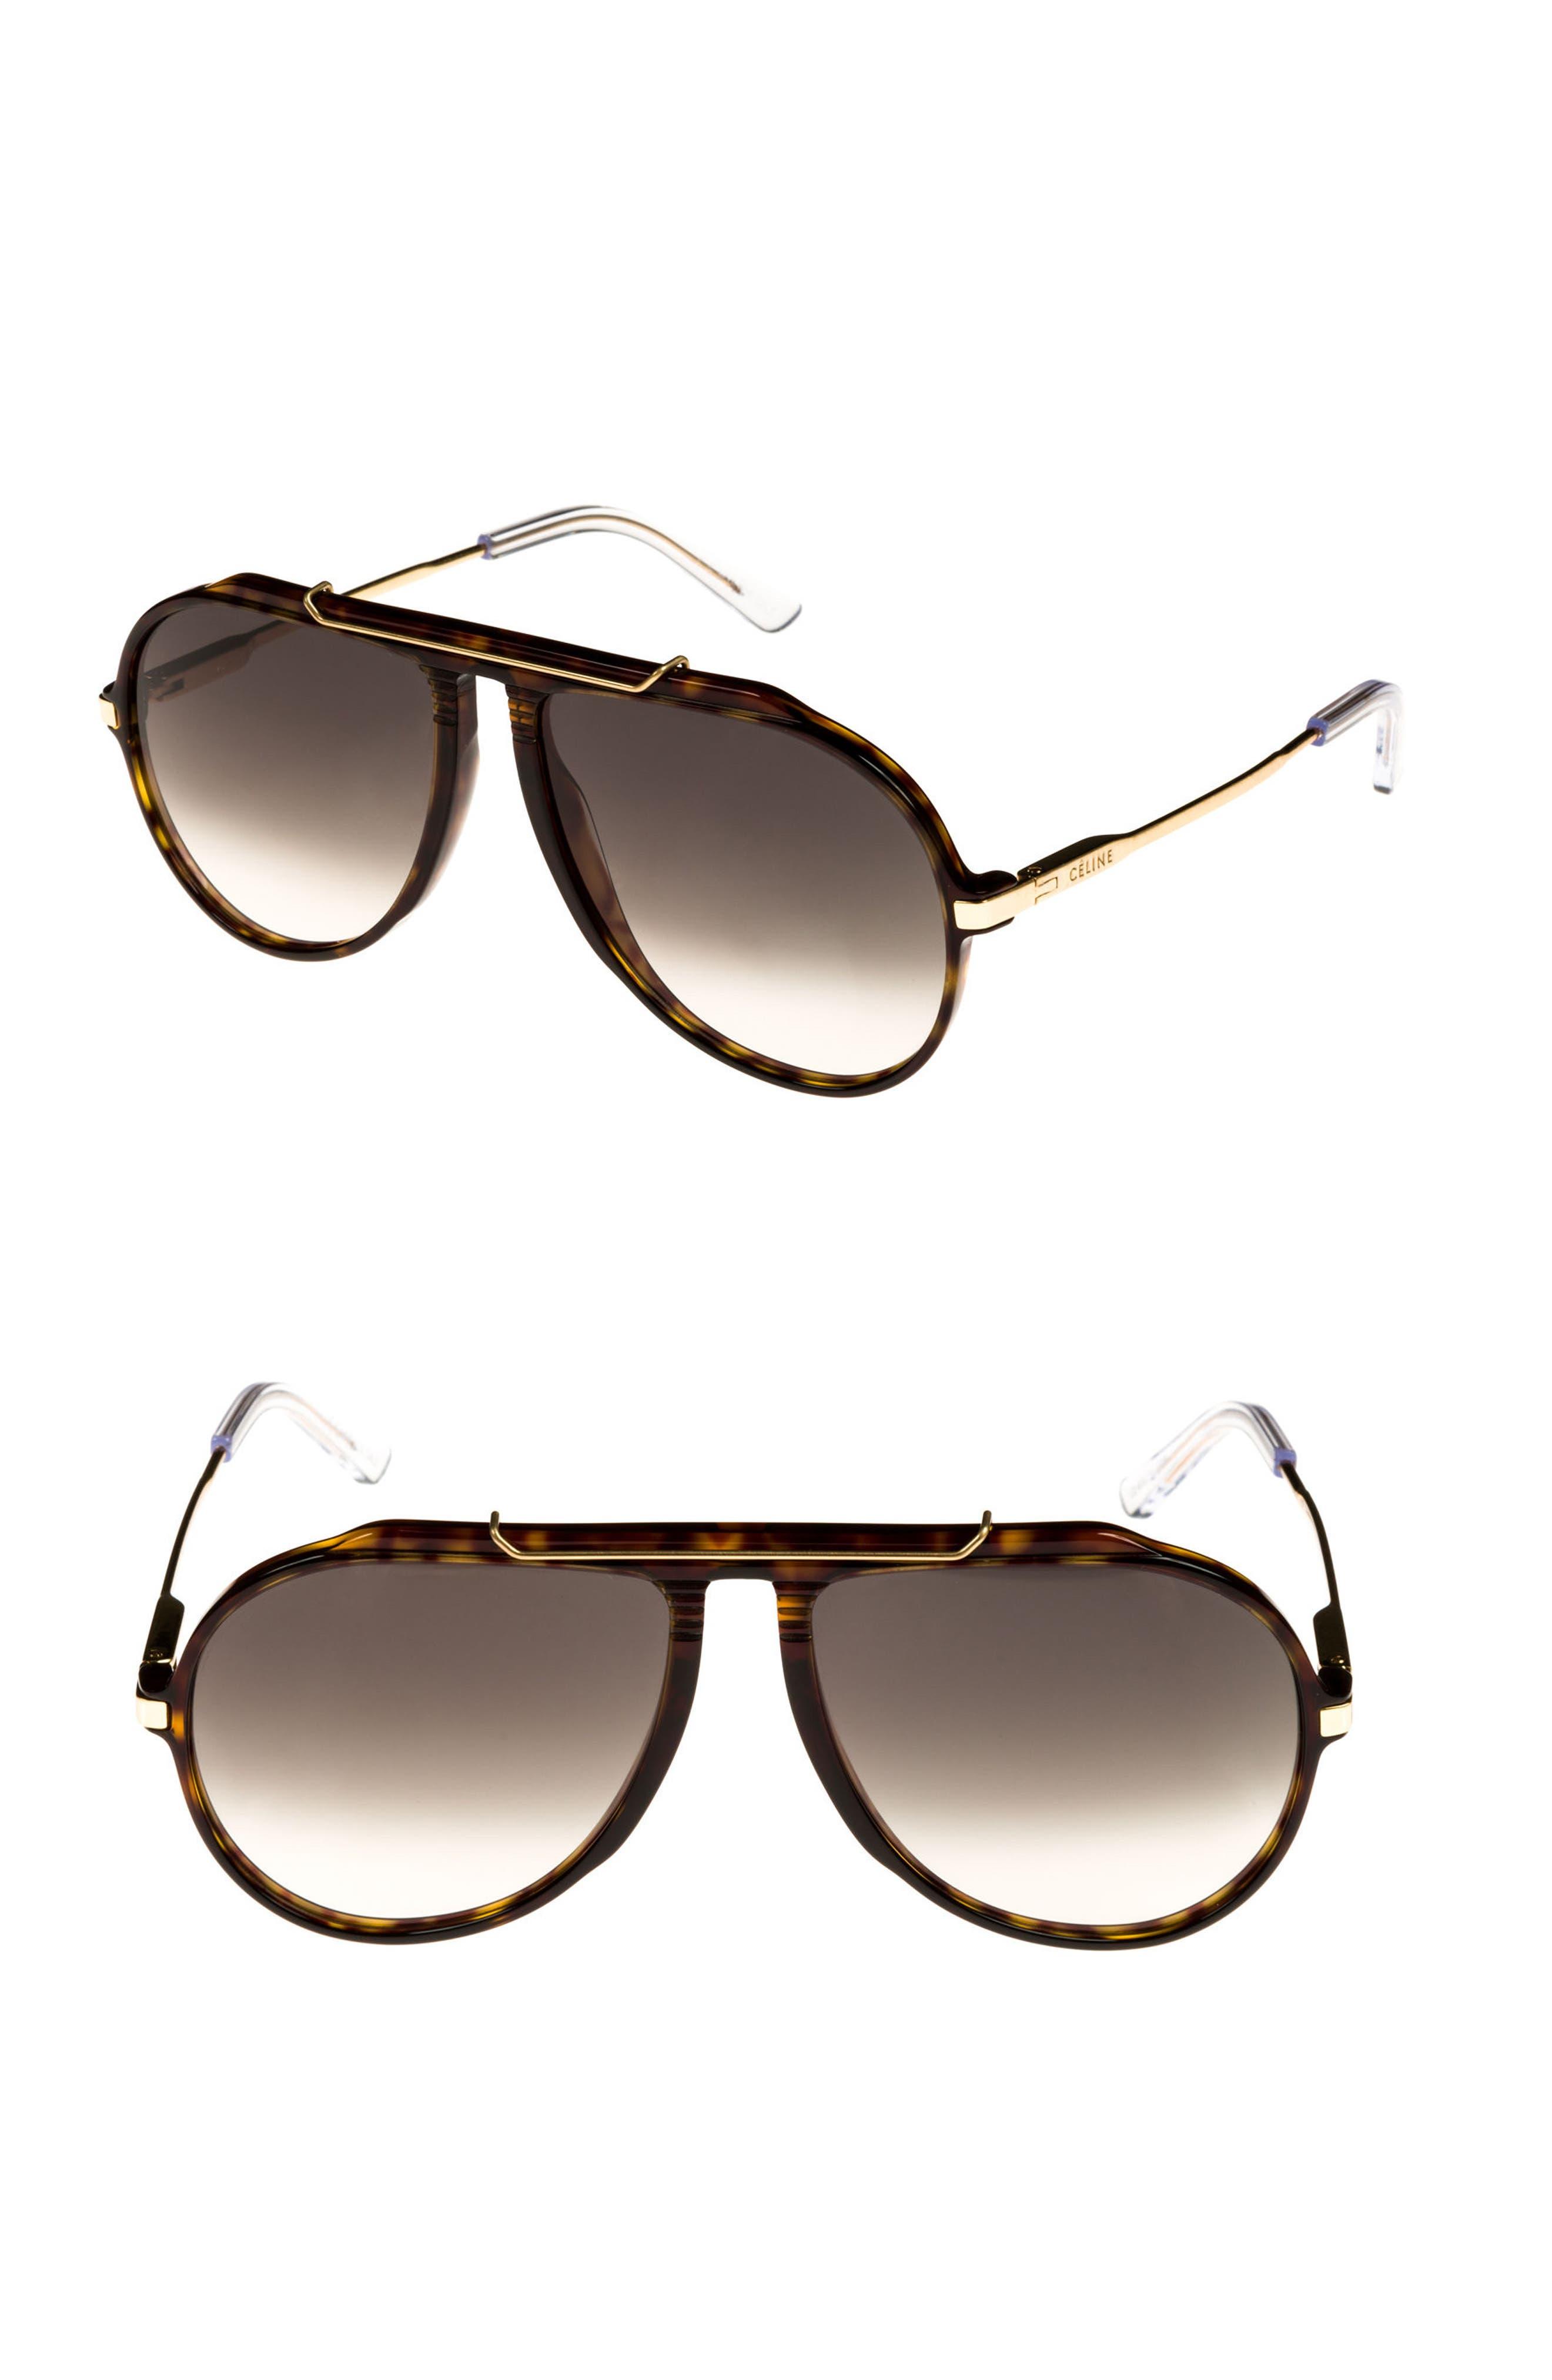 60mm Gradient Aviator Sunglasses,                             Main thumbnail 1, color,                             264